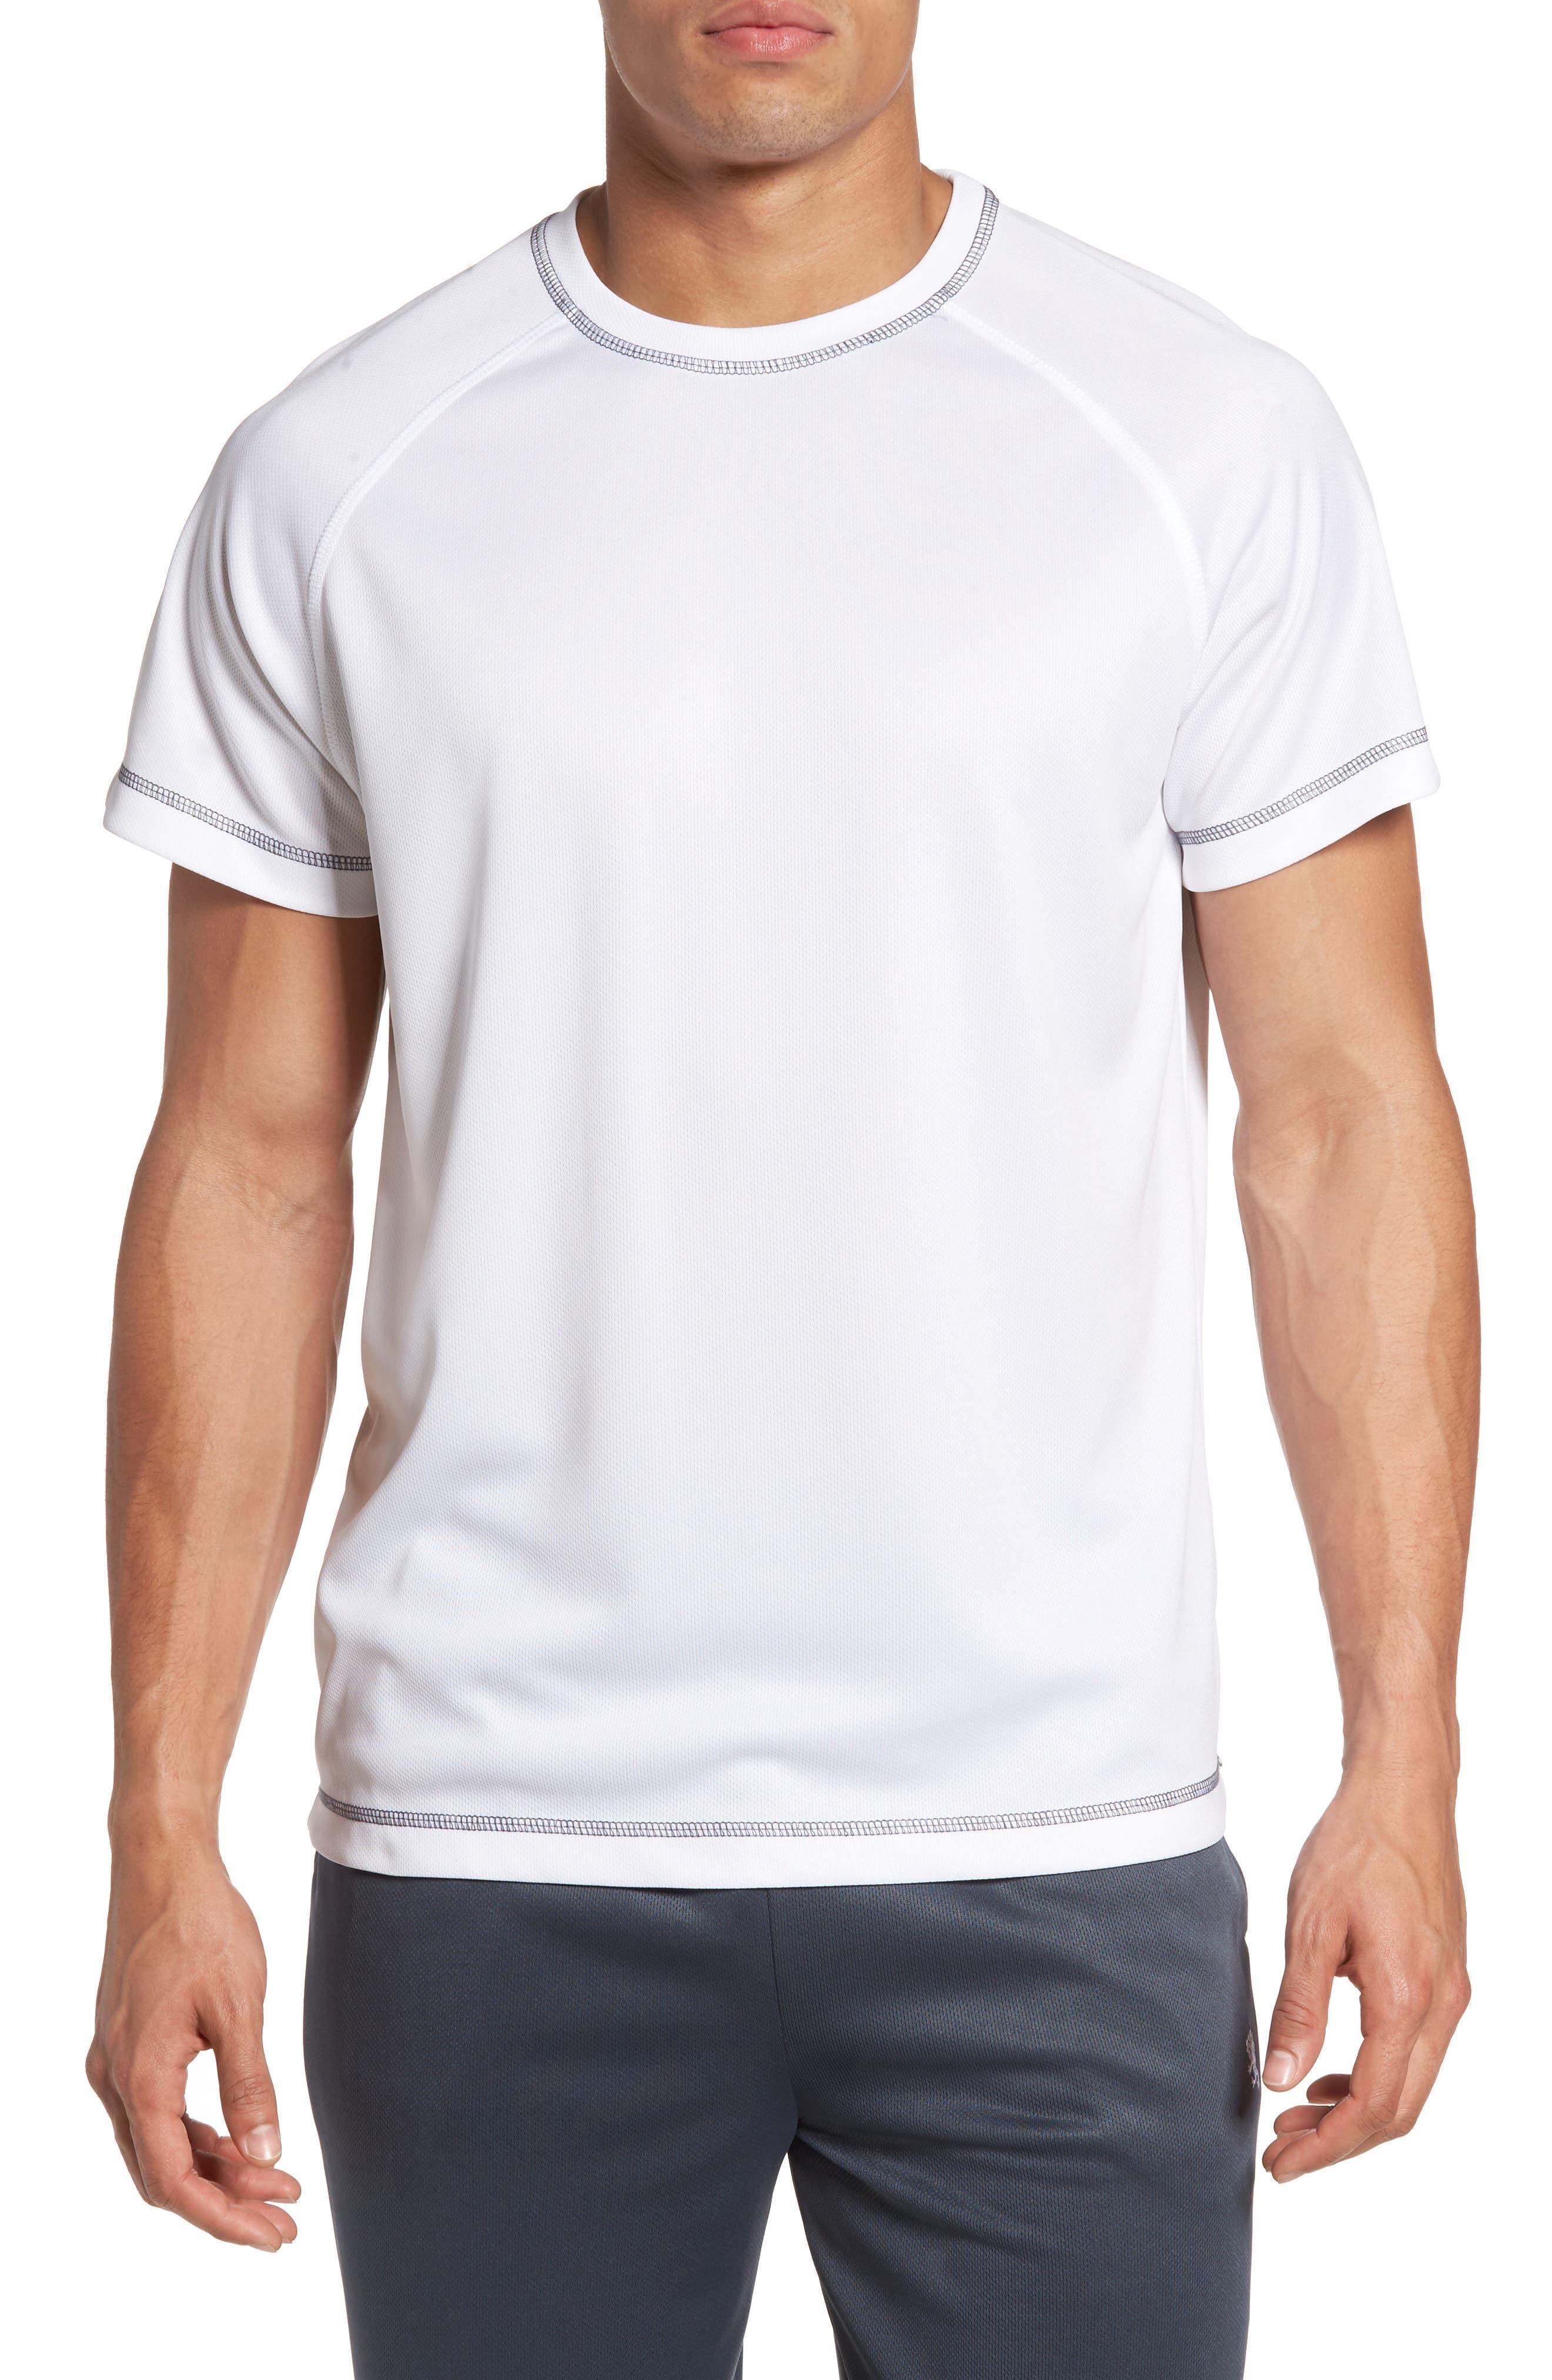 Majestic International Work Out Crewneck T-Shirt (Big & Tall)